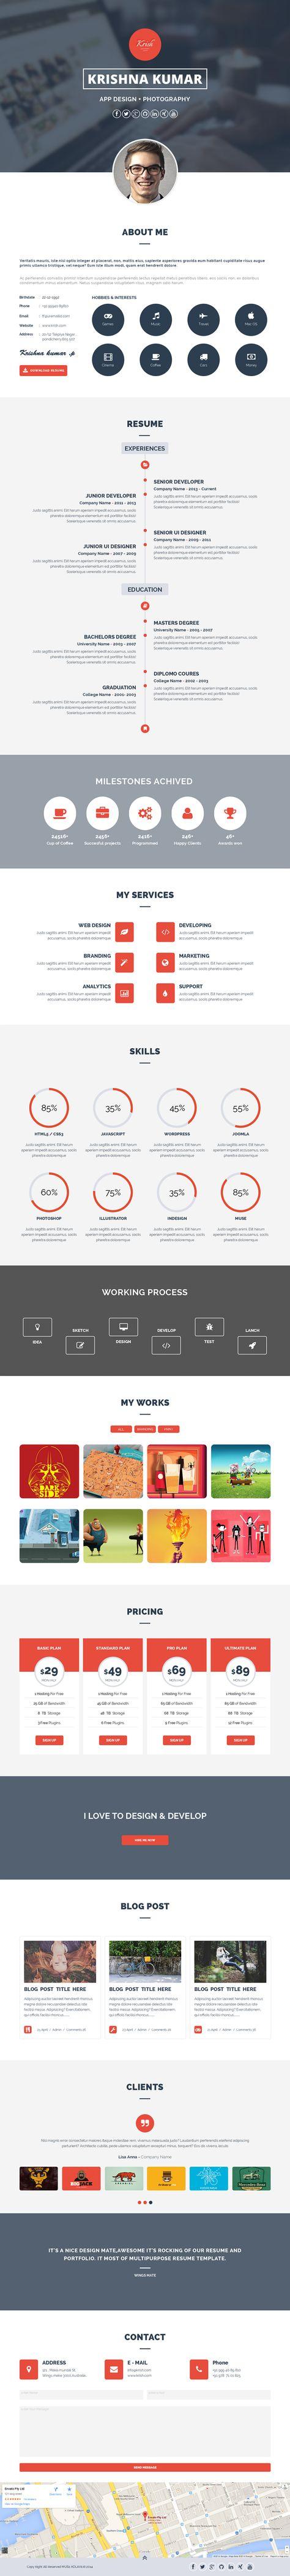 Portfolio | Design | Webdesign | Website - design process and skills sections